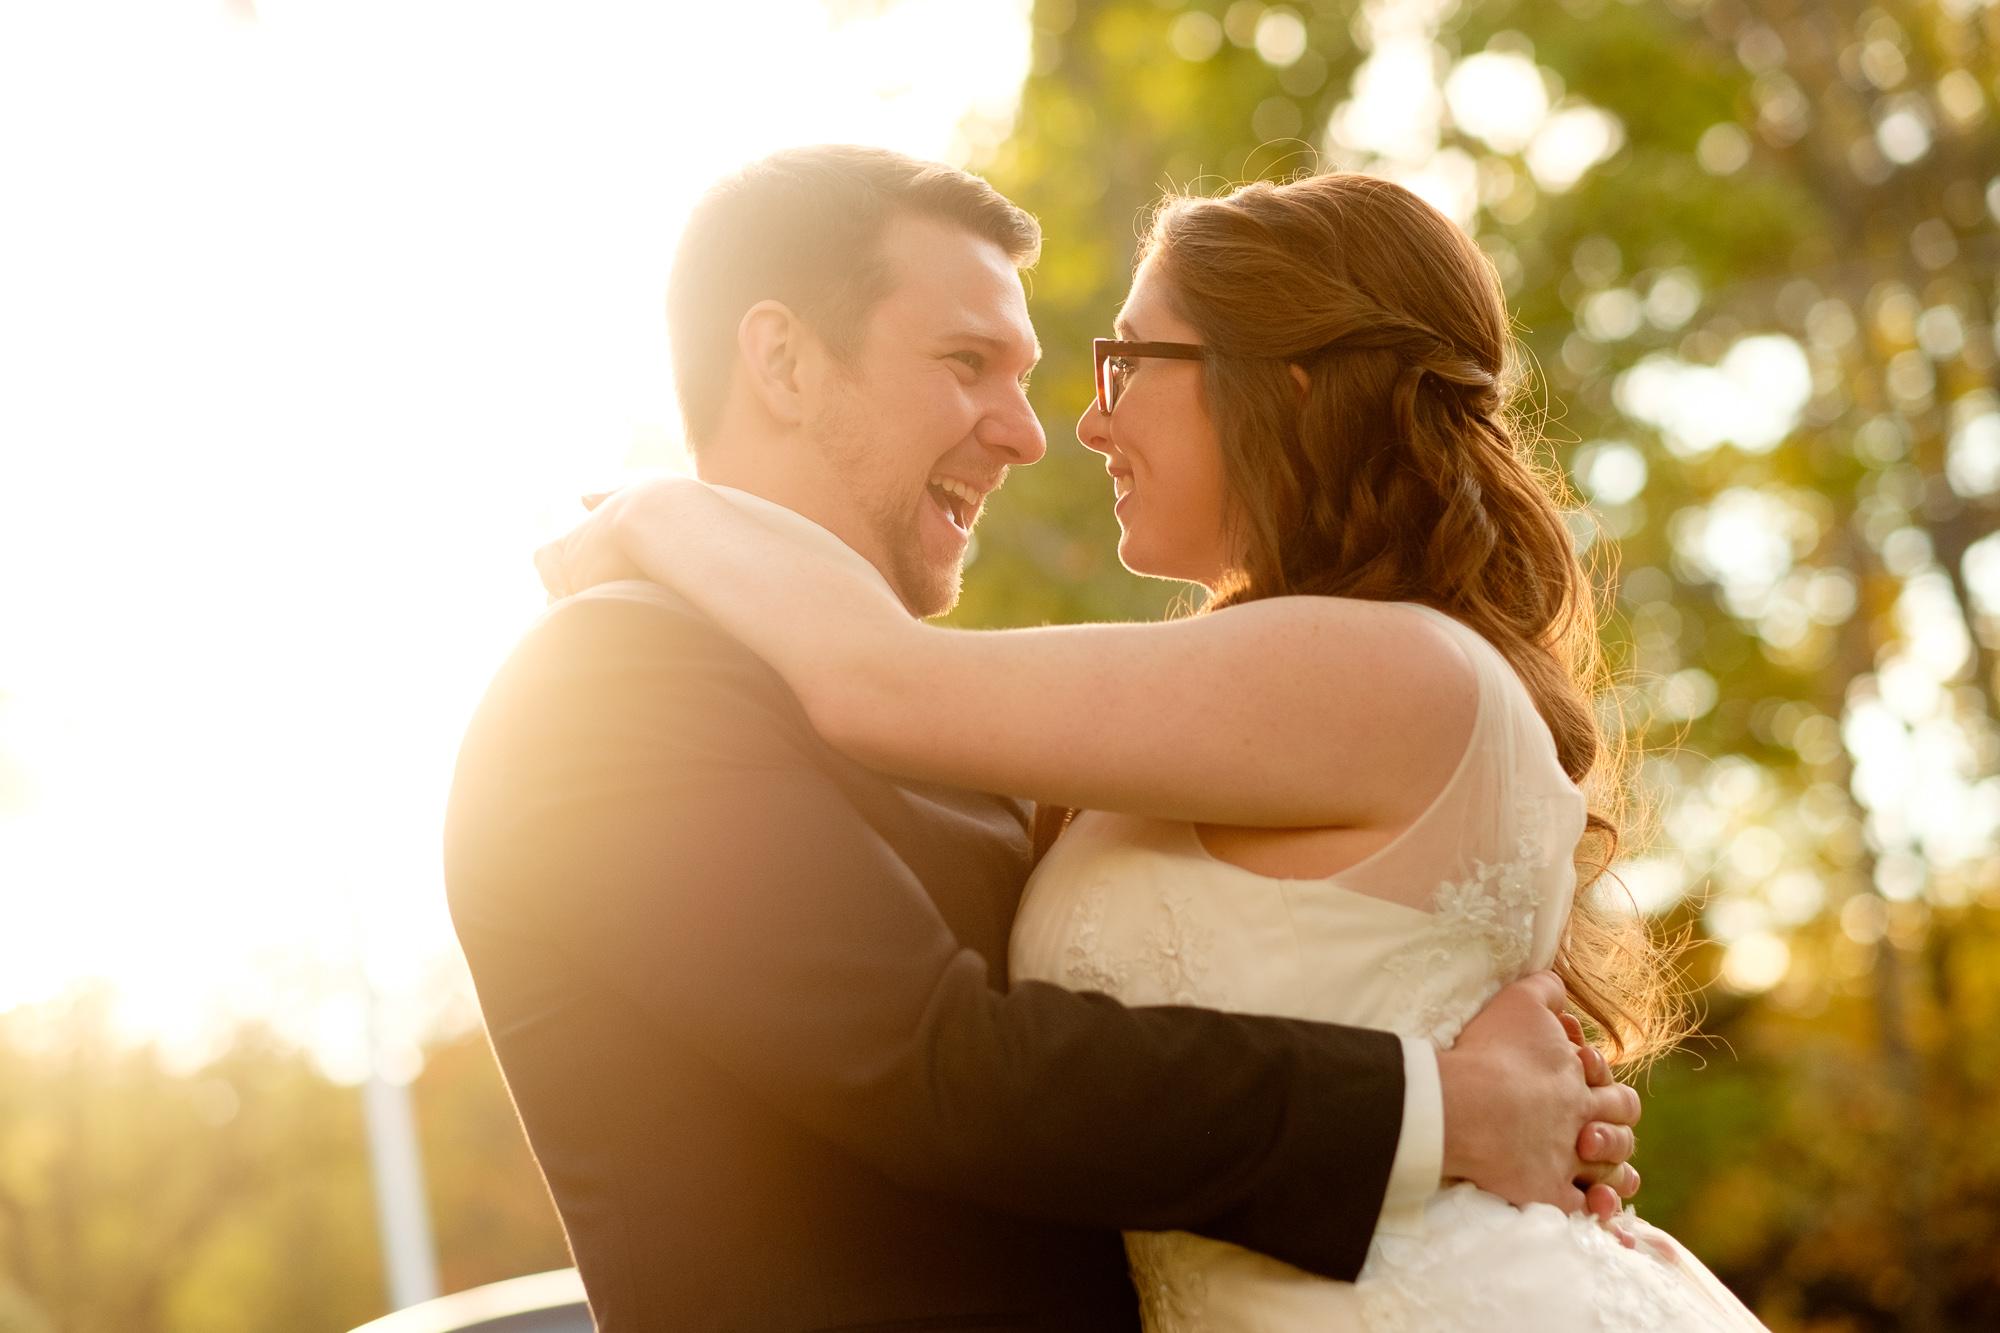 ancaster-mill-wedding-photograph-004.jpg